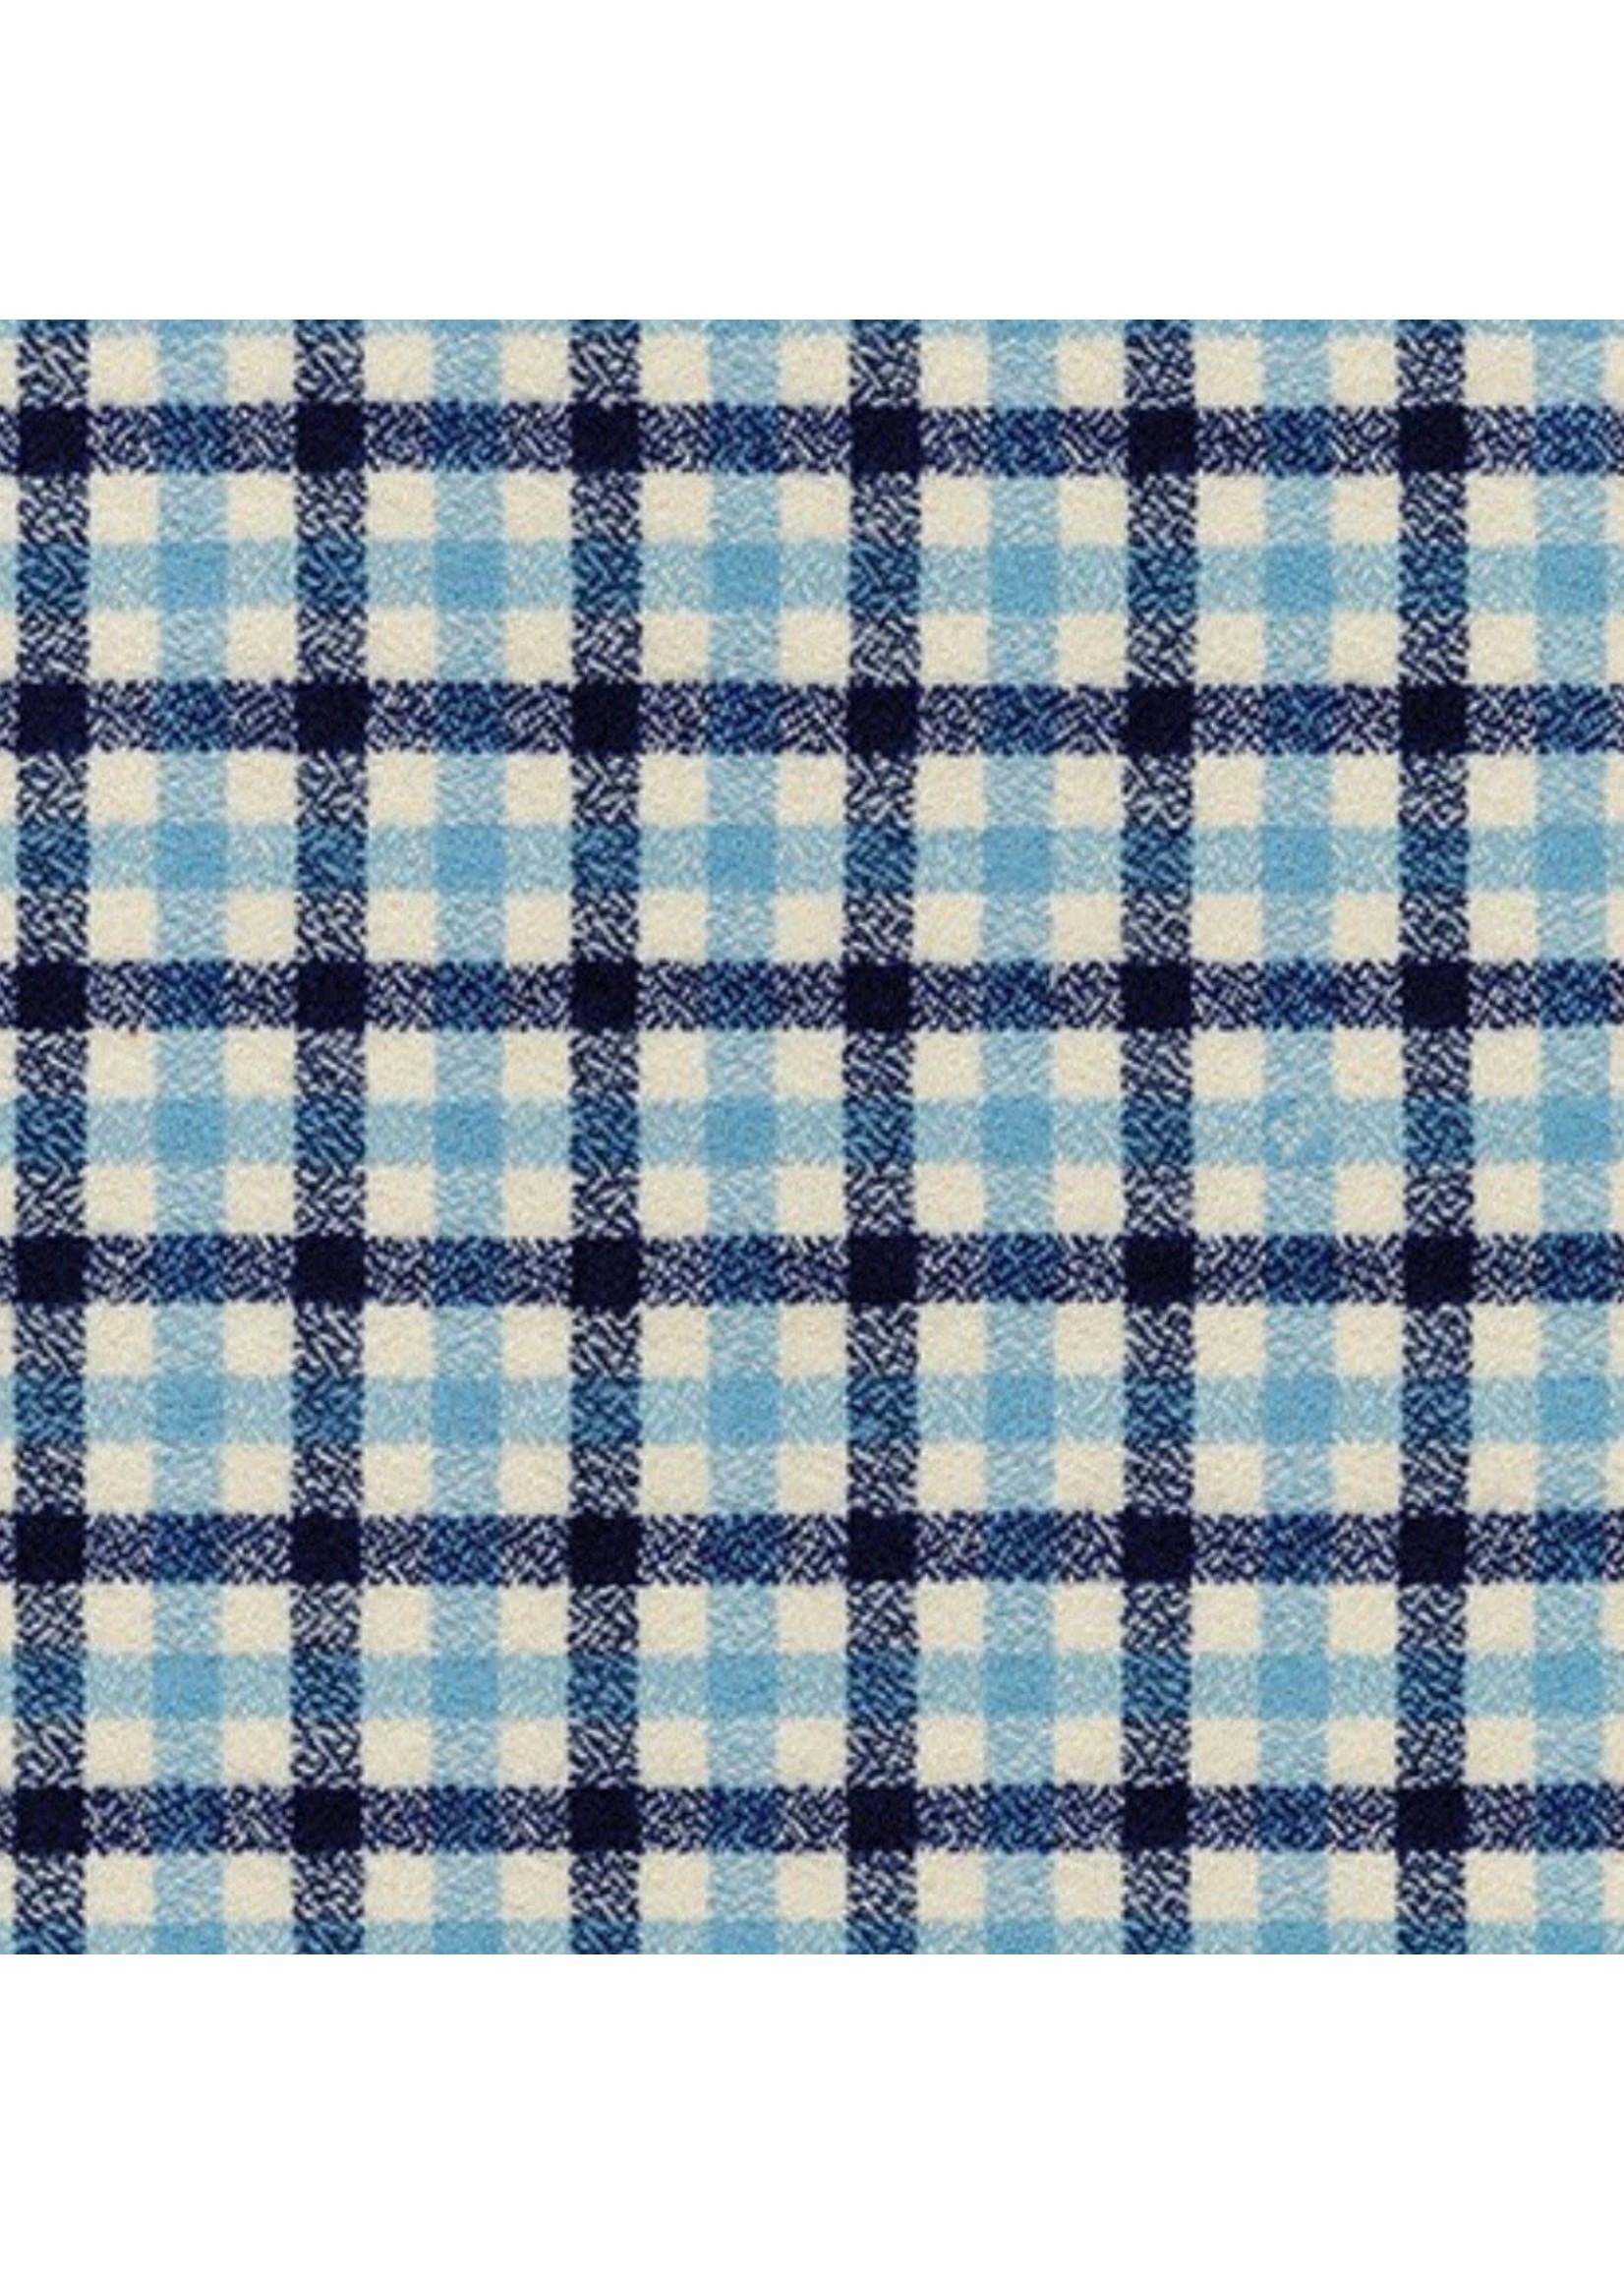 james and lottie Blue Plaid Ryan Shirt